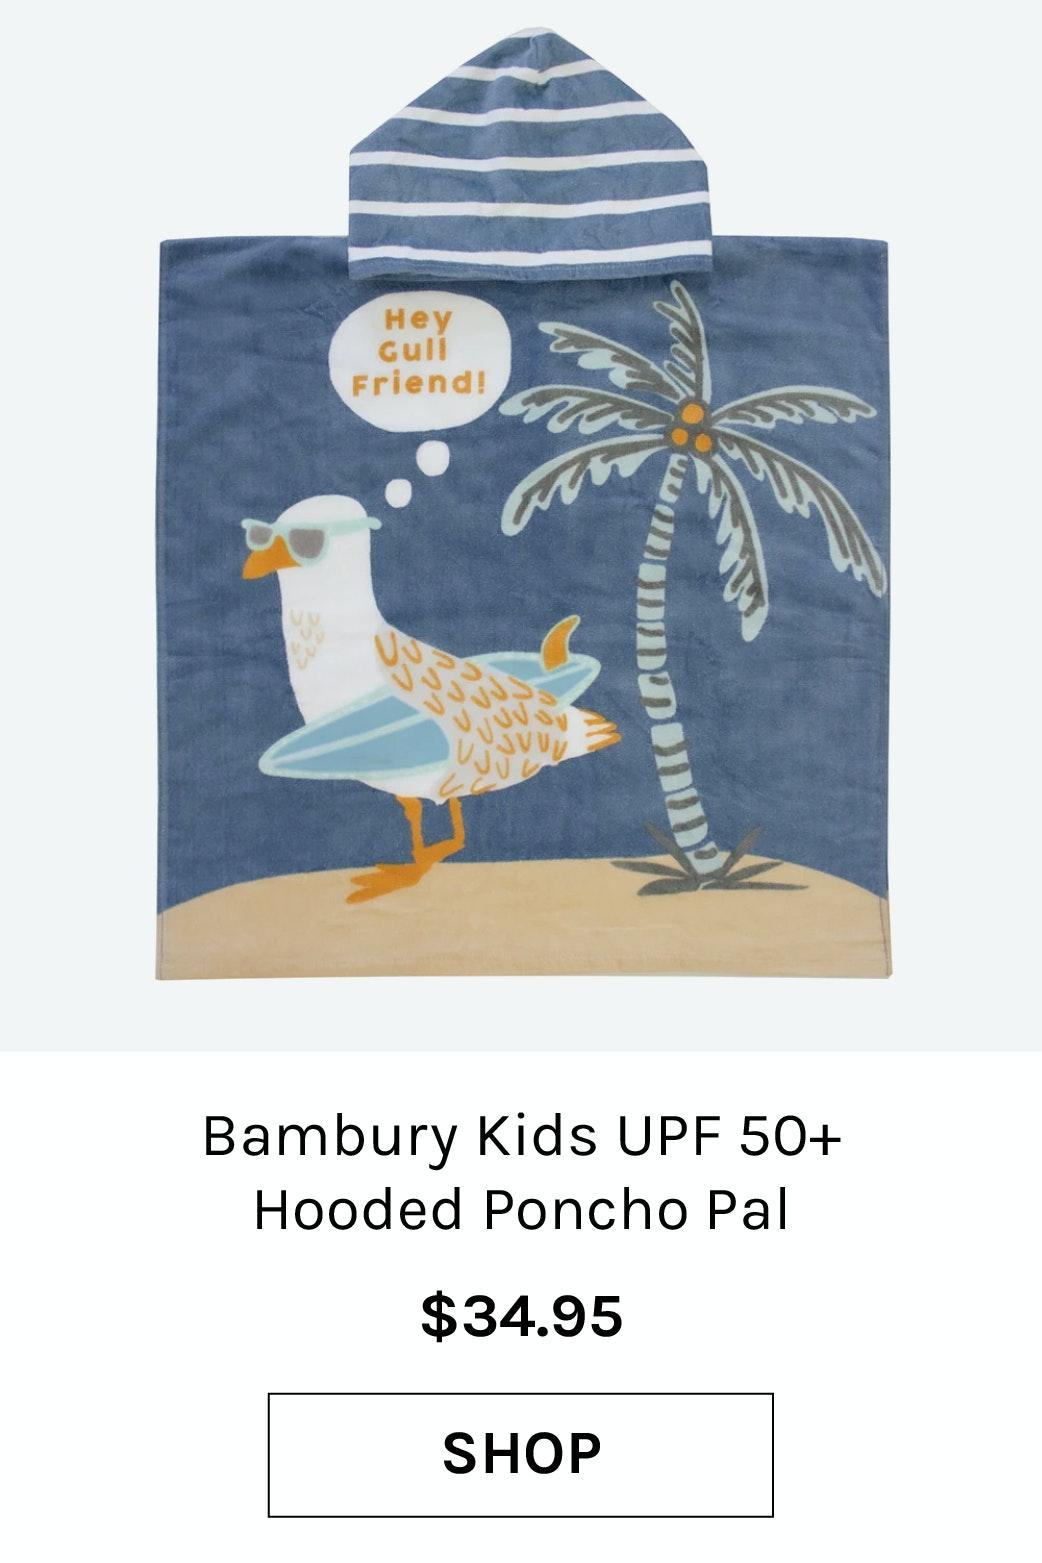 Bambury Kids UPF 50+ Hooded Poncho Pal